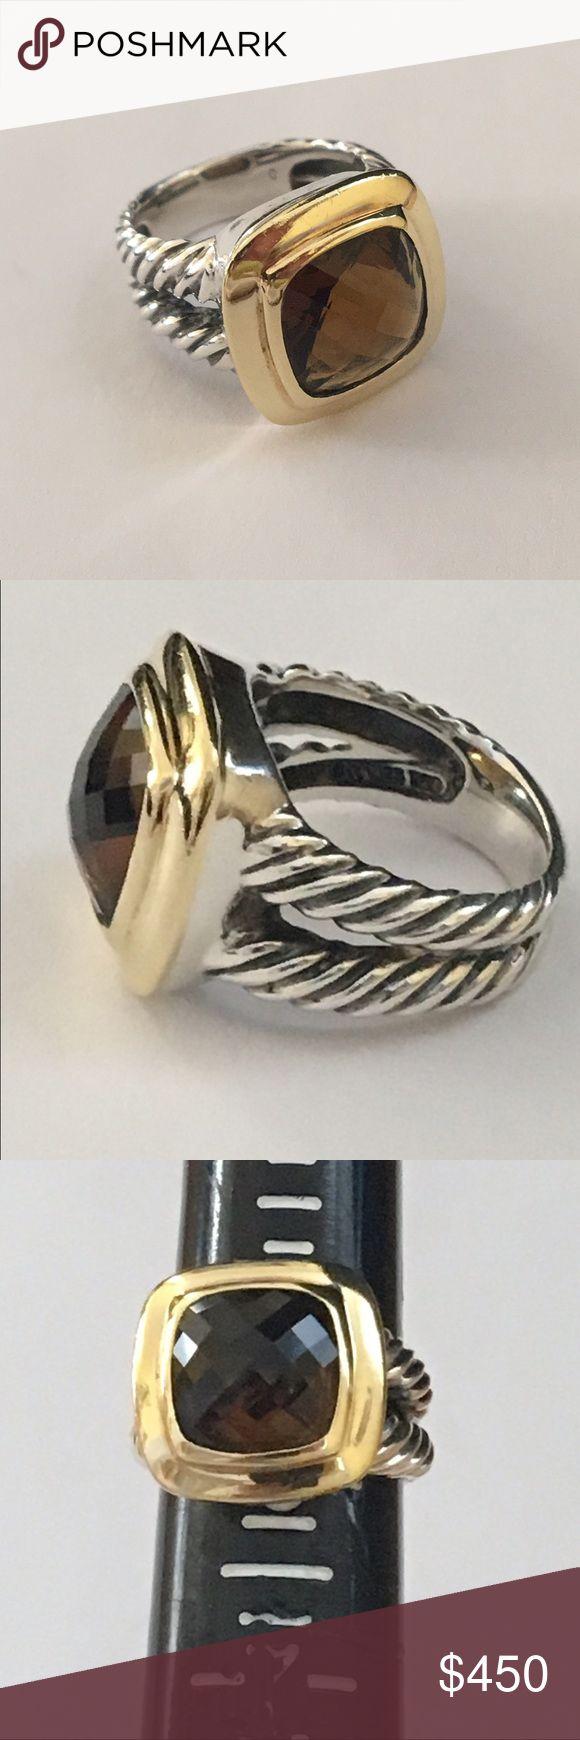 david yurman sterling 18k gold smoky quartz ring 11mm split shank albion collection ring from david